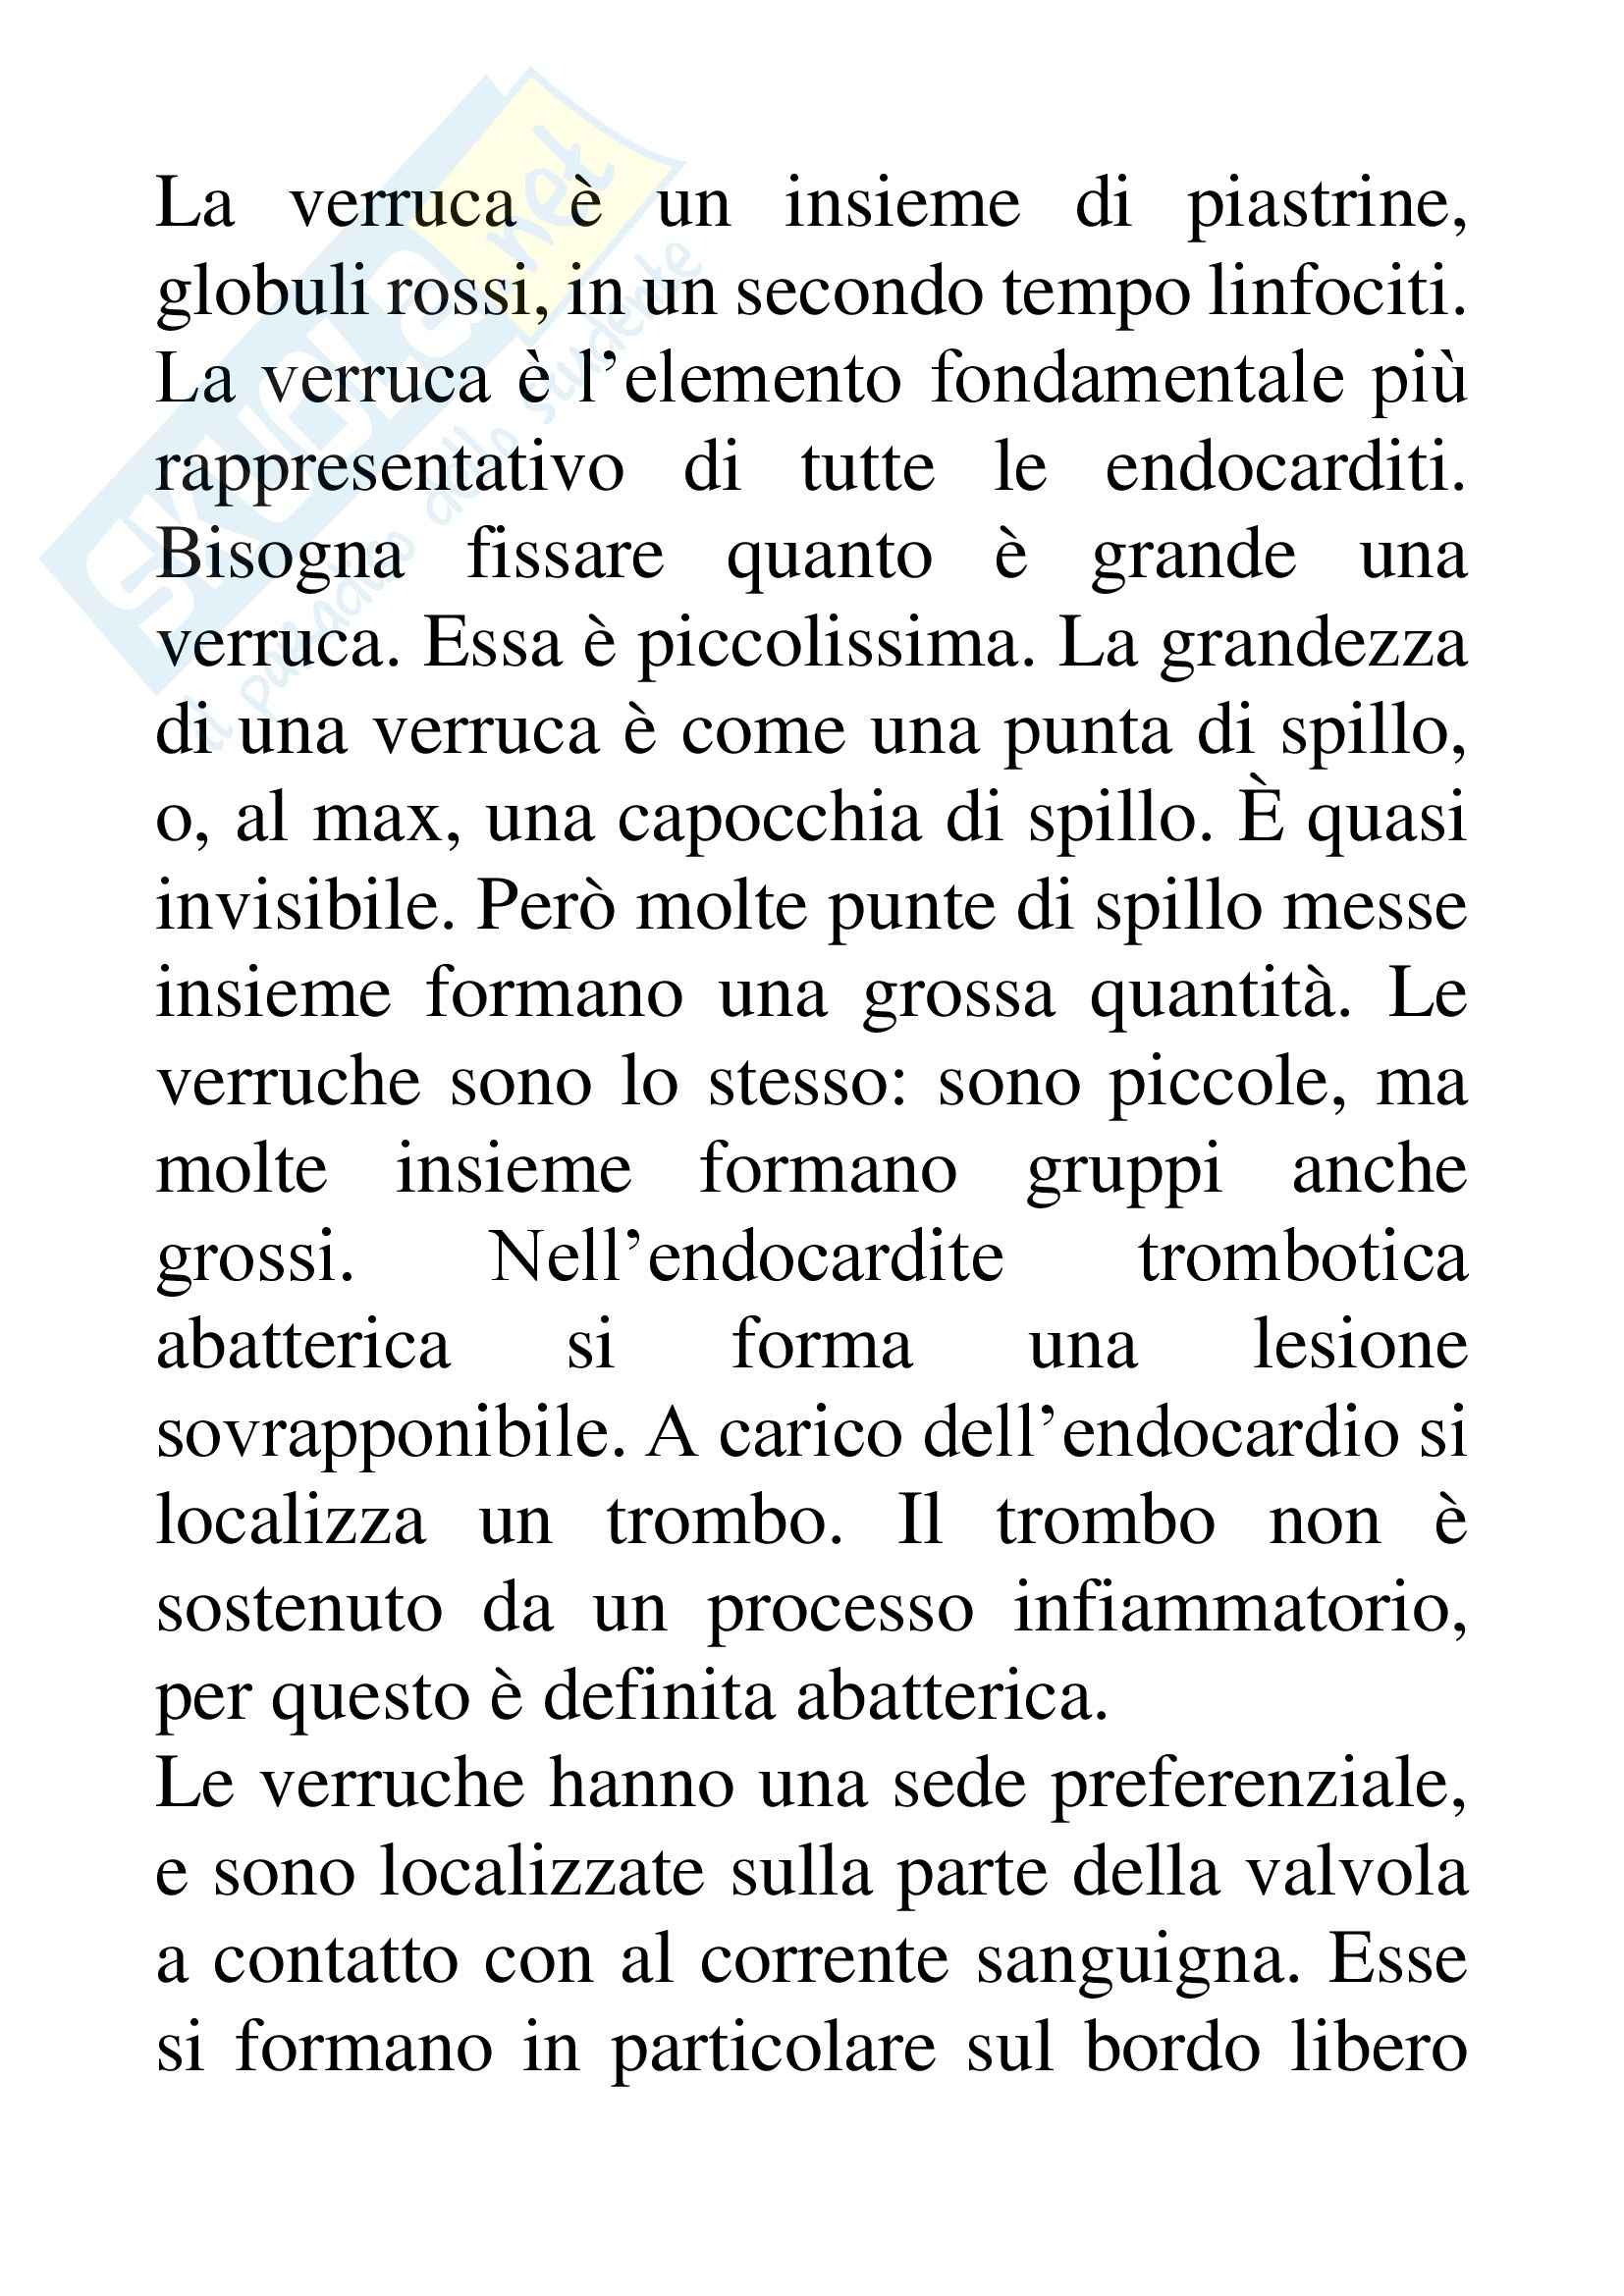 Anatomia patologica - Endocardite marantica Pag. 2